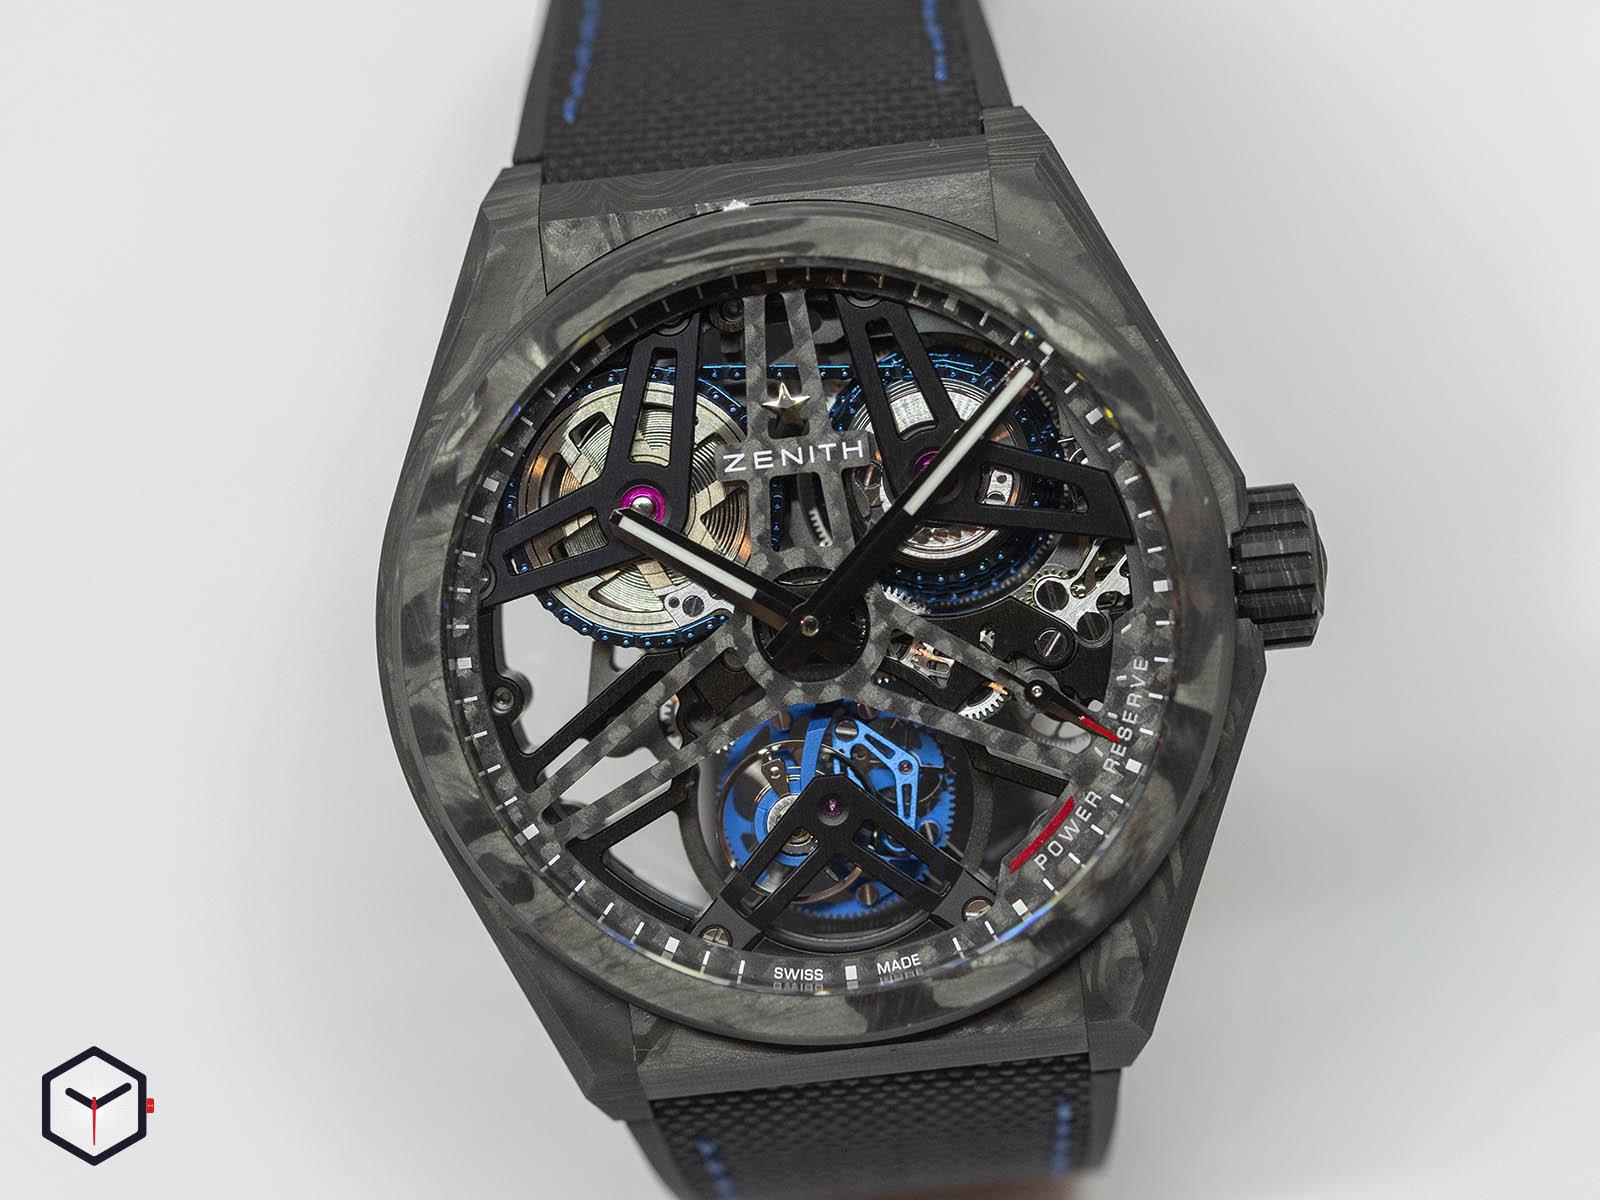 10-9000-4805-78-r916-zenith-defy-fusee-tourbillon-carbon-3.jpg